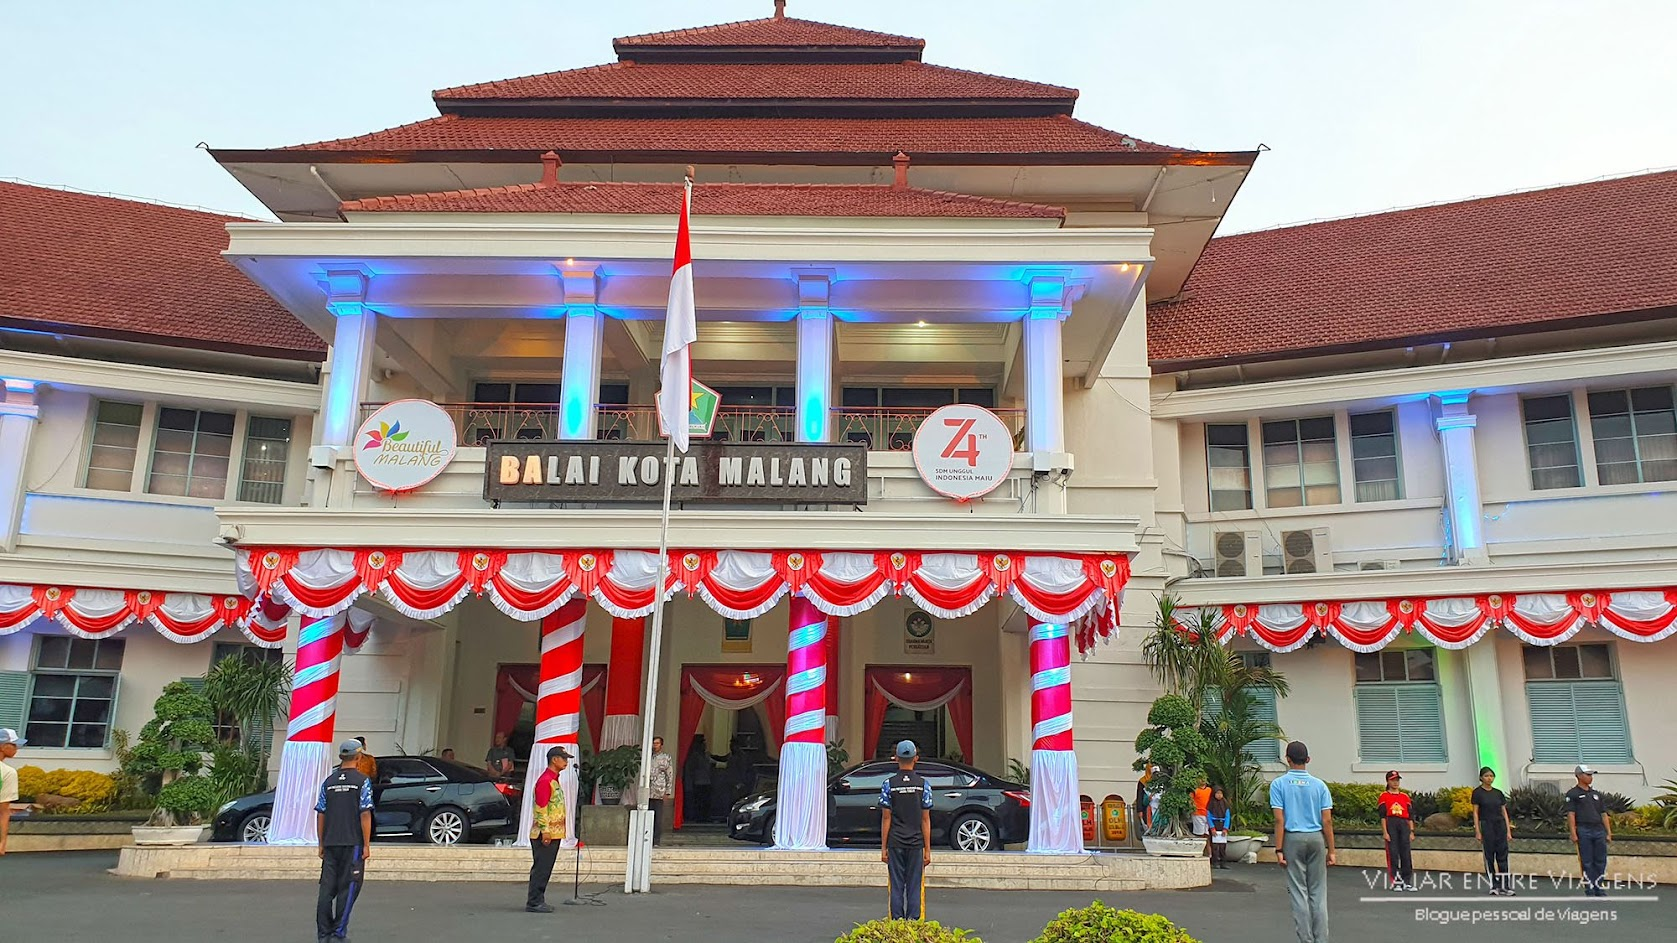 Dia 35 – Conhecer melhor Malang e visitar KAMPUNG WARNA WARNI